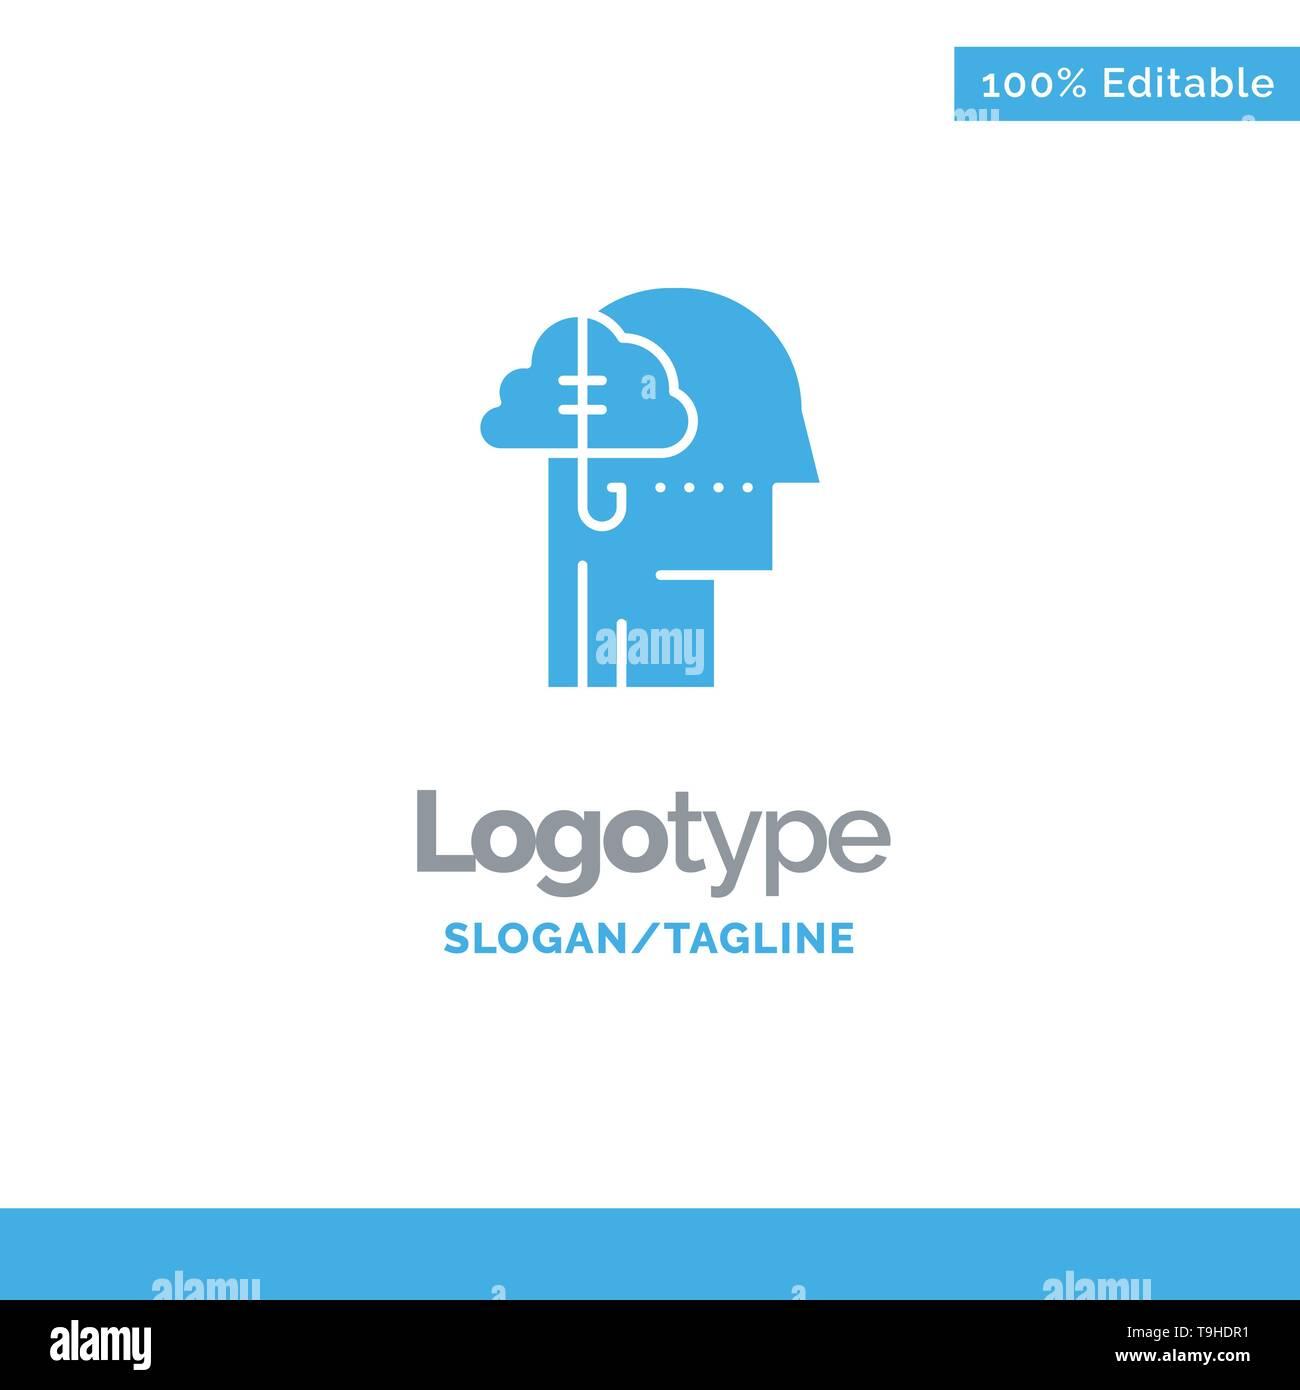 Borrowing Ideas, Addiction, Catch, Habit, Human Blue Solid Logo Template. Place for Tagline - Stock Image